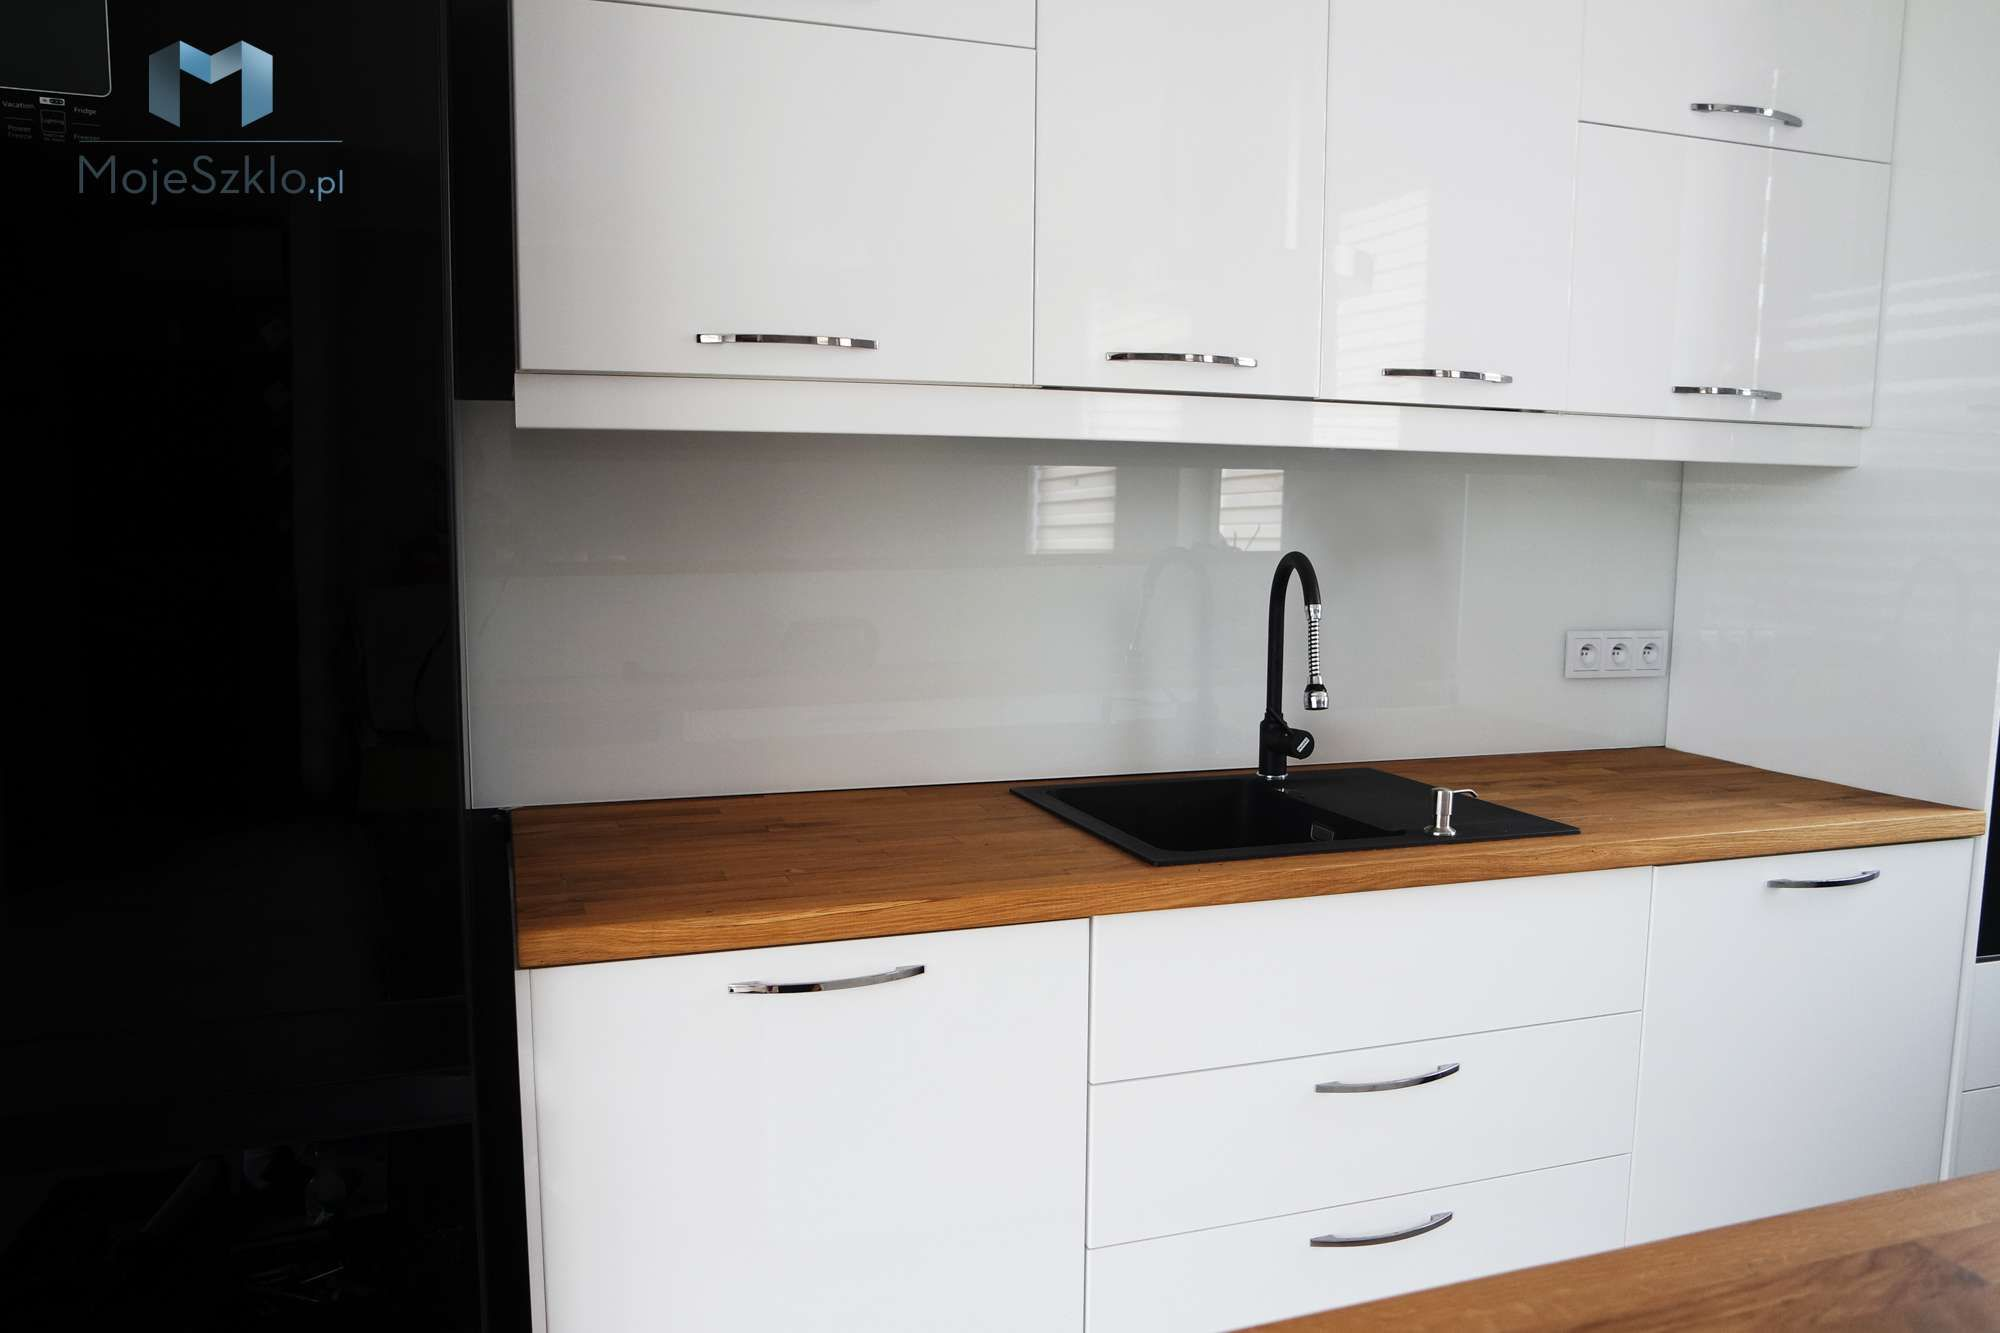 Bialy Lacobel Home Decor Decor Kitchen